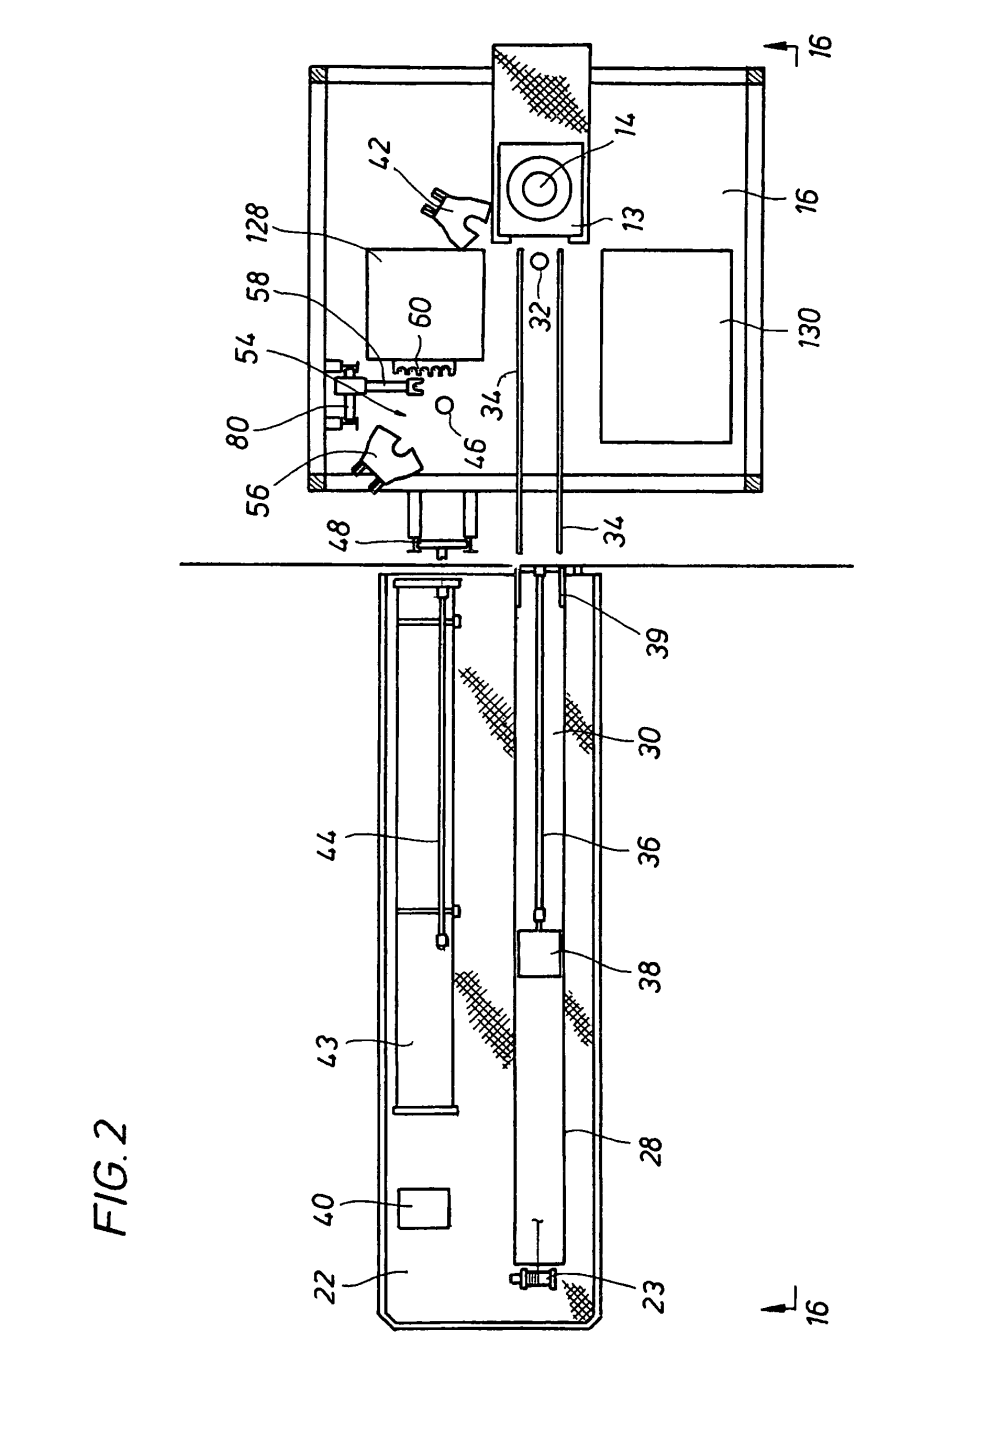 medium resolution of 2003 e450 fuse panel 2001 2002 2003 2004 ford e150 e250 e350 e450 2004 ford e 450 fuse box diagram